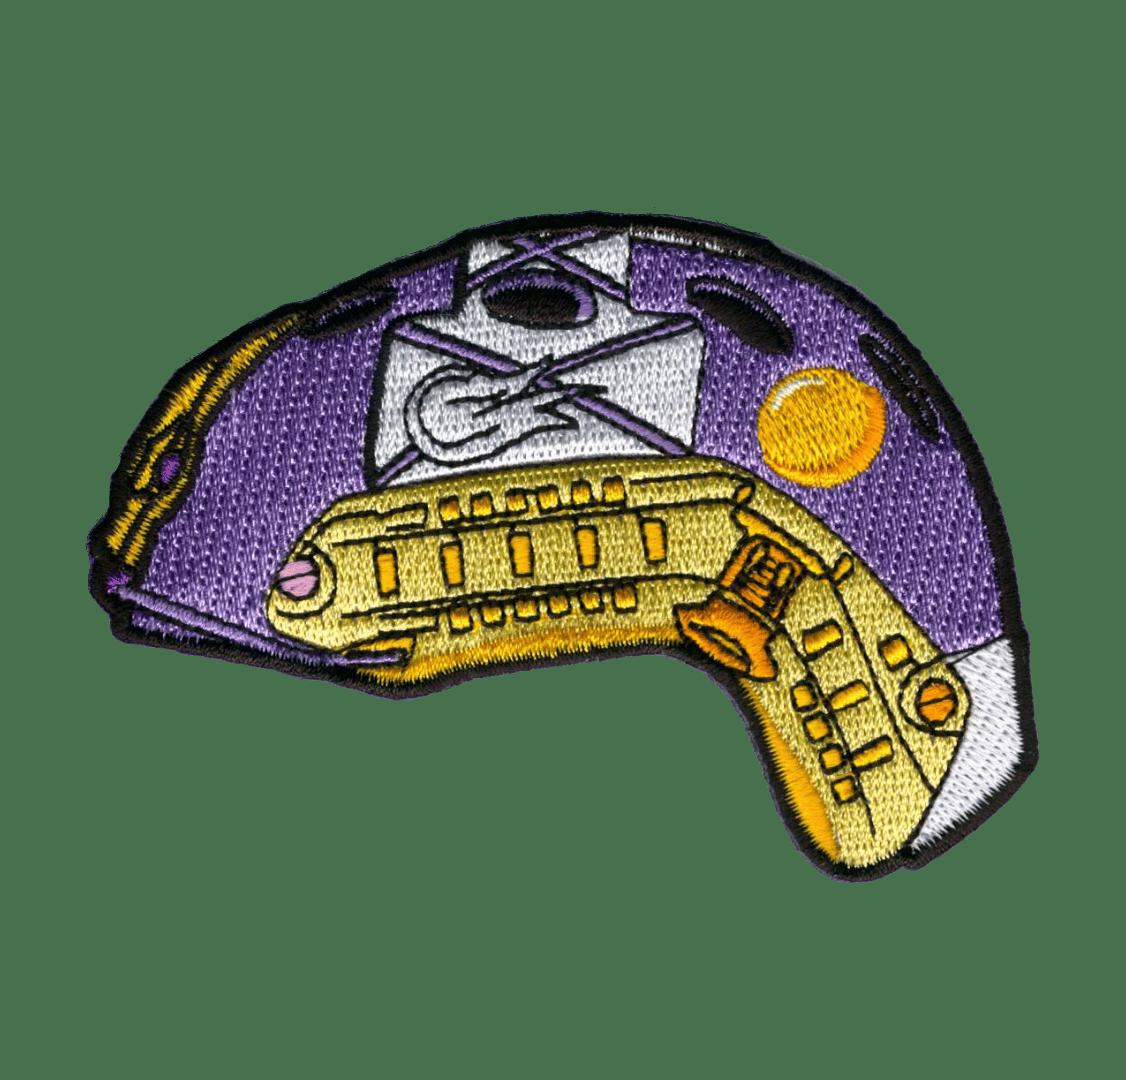 Image of Eris Bump Helmet Patch